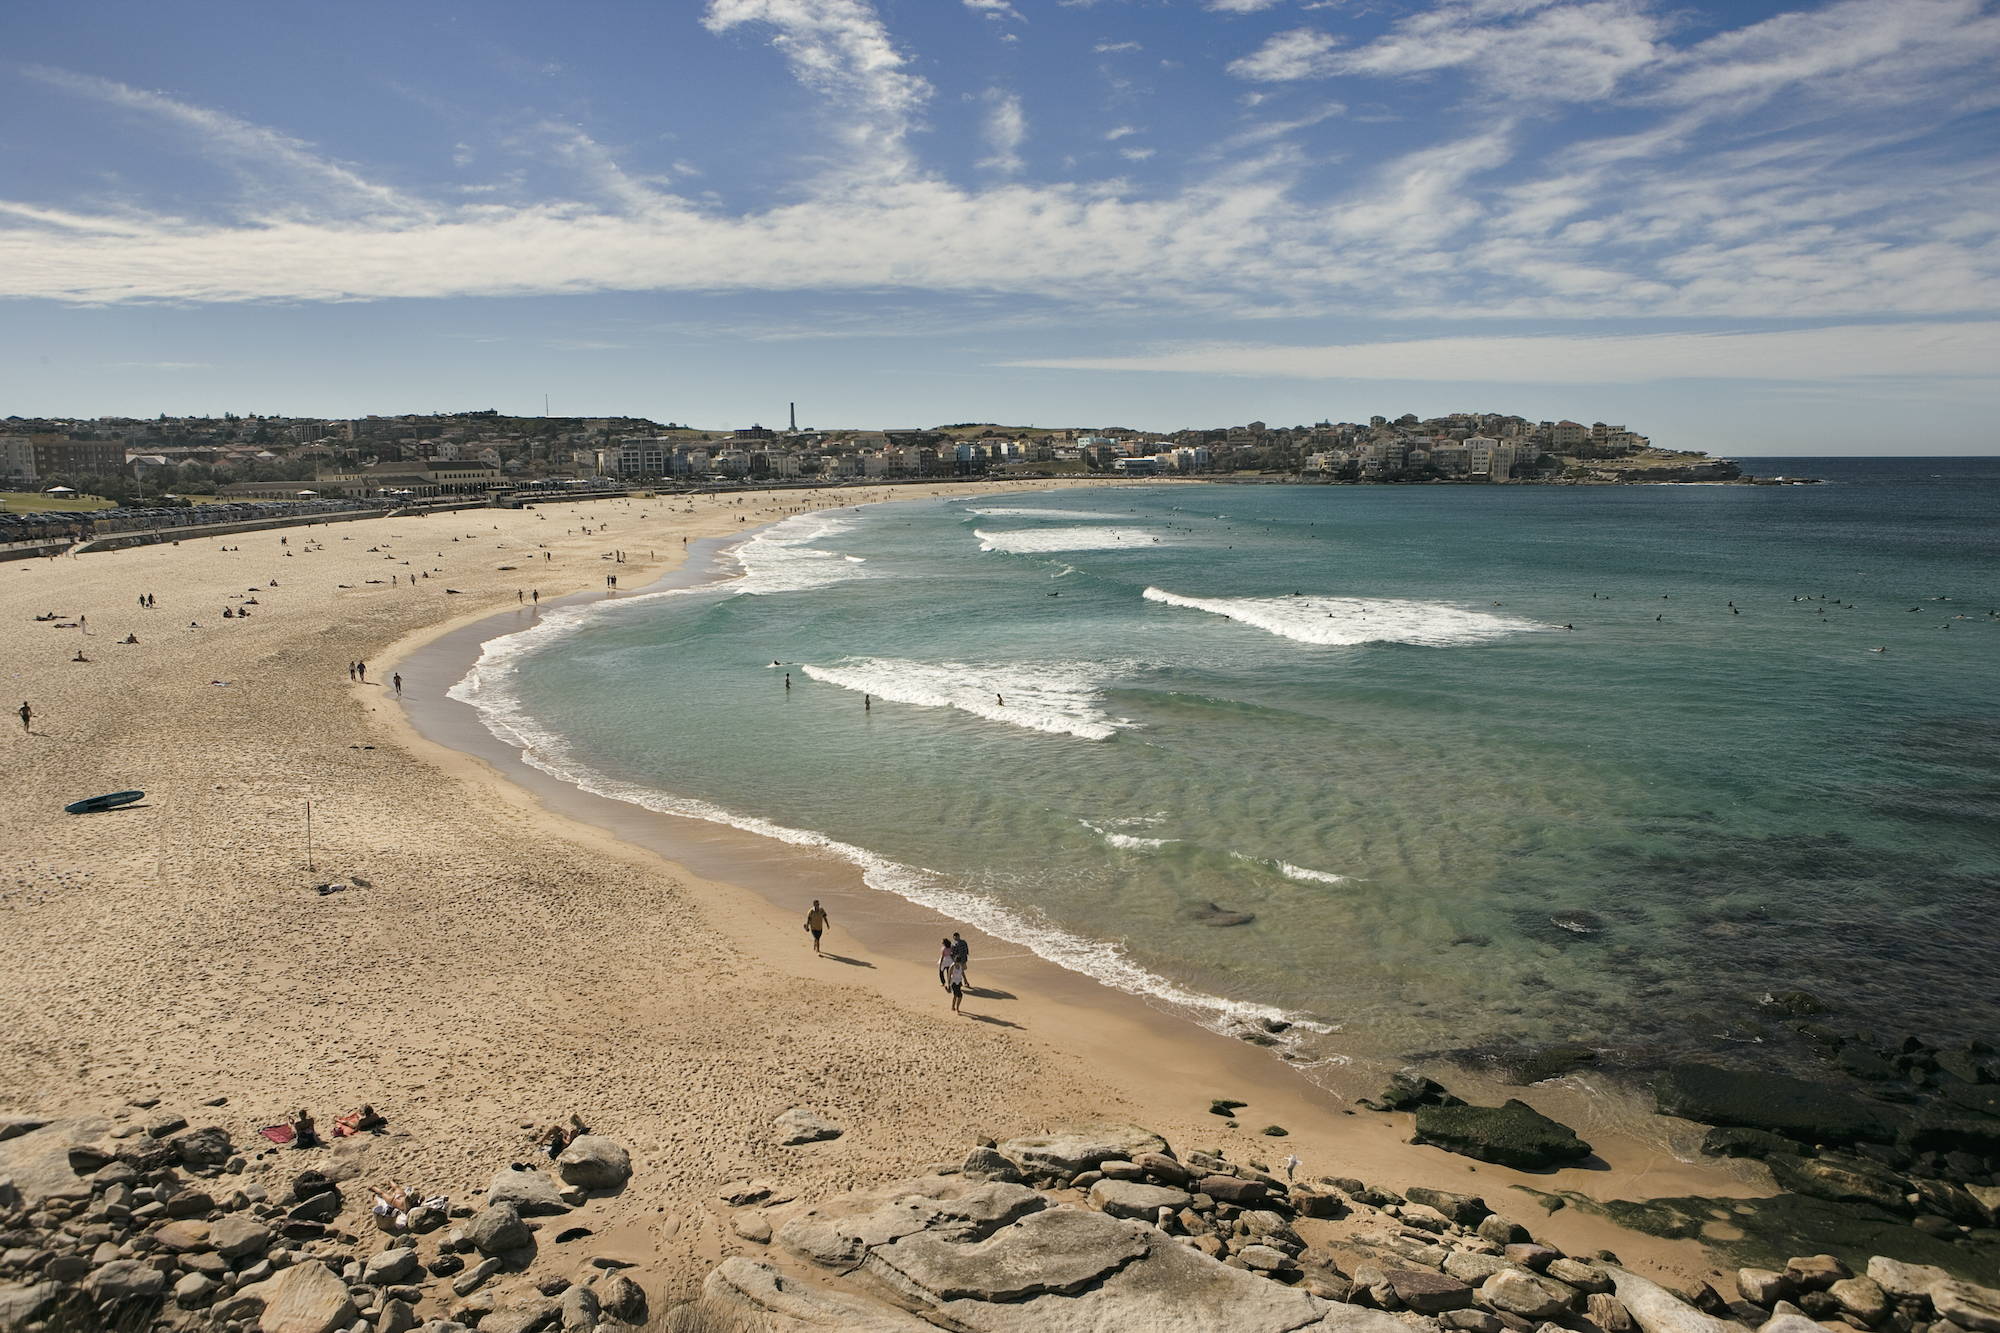 Beautiful beach in Sydney, Australia